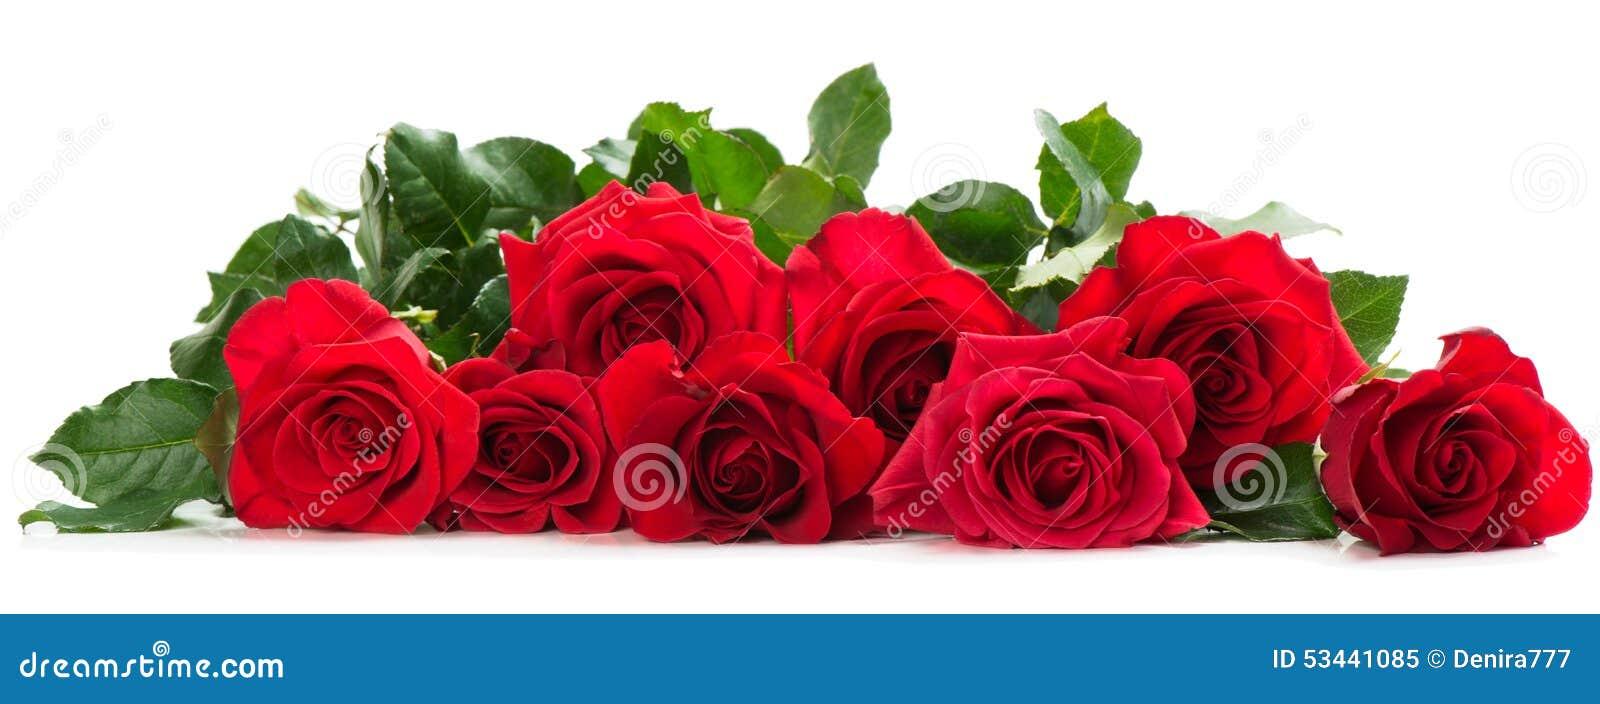 Poche rose rosse